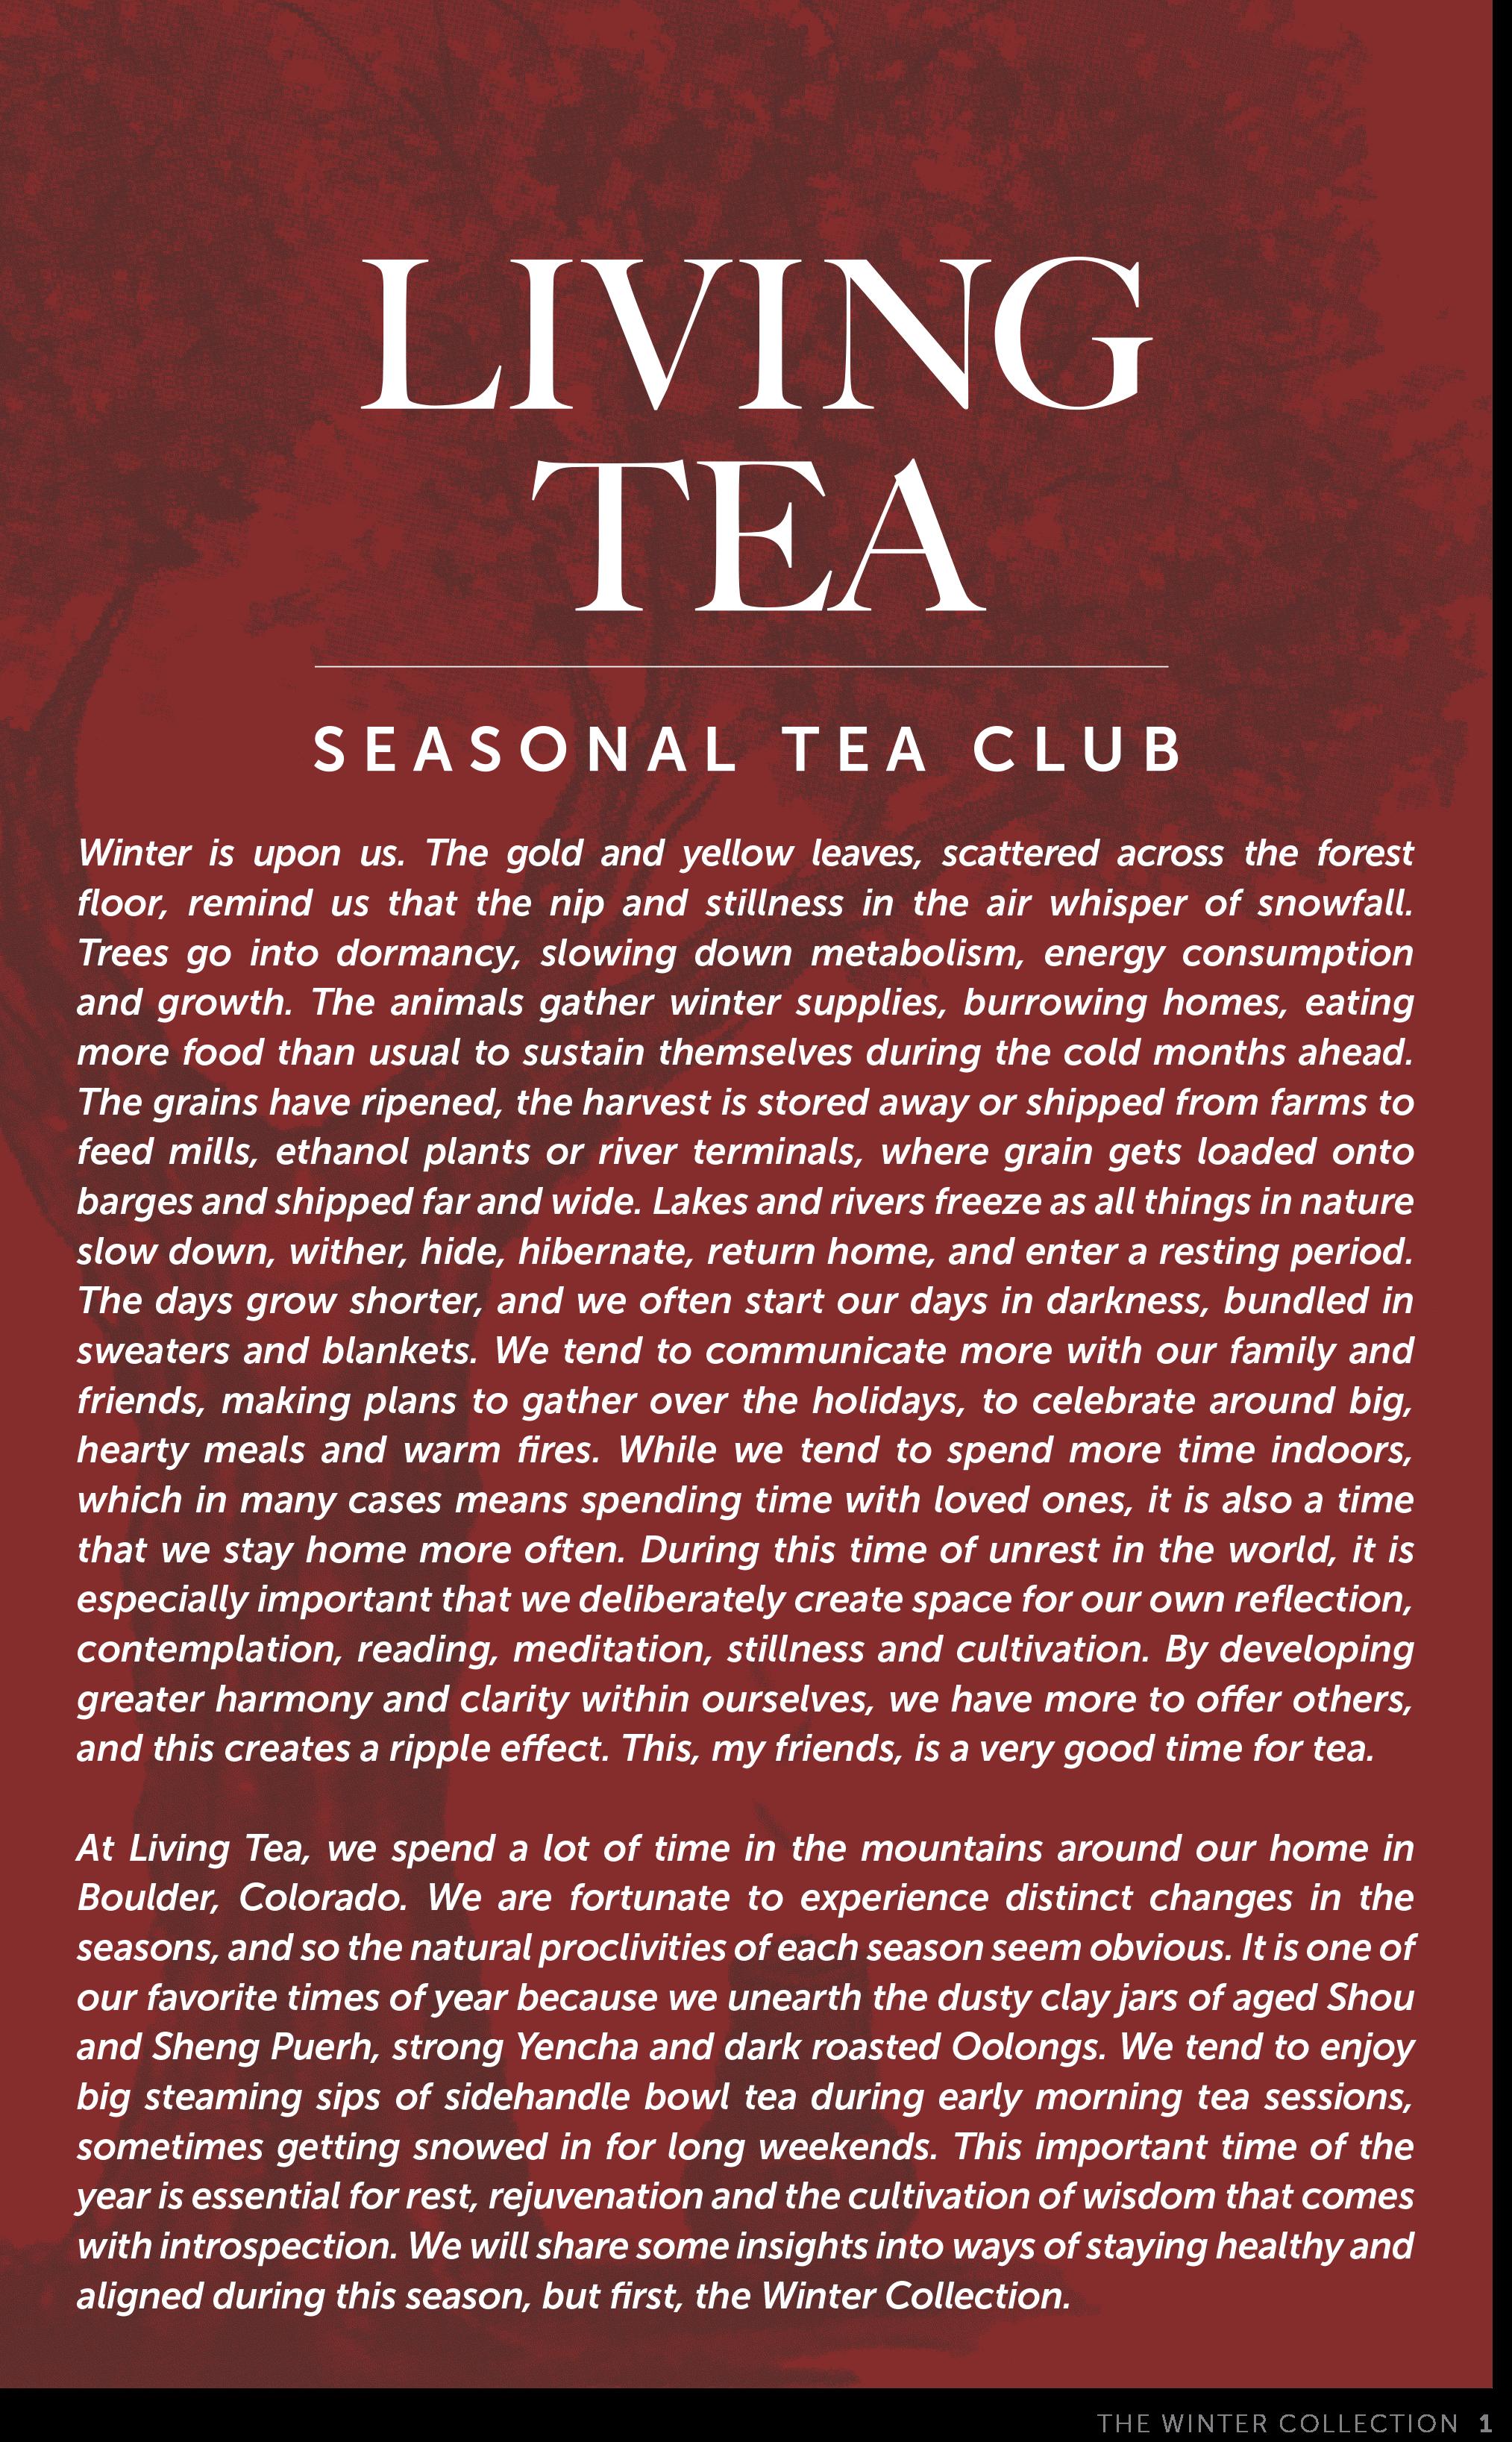 Living Tea Seasonal Tea Club Winter 2018